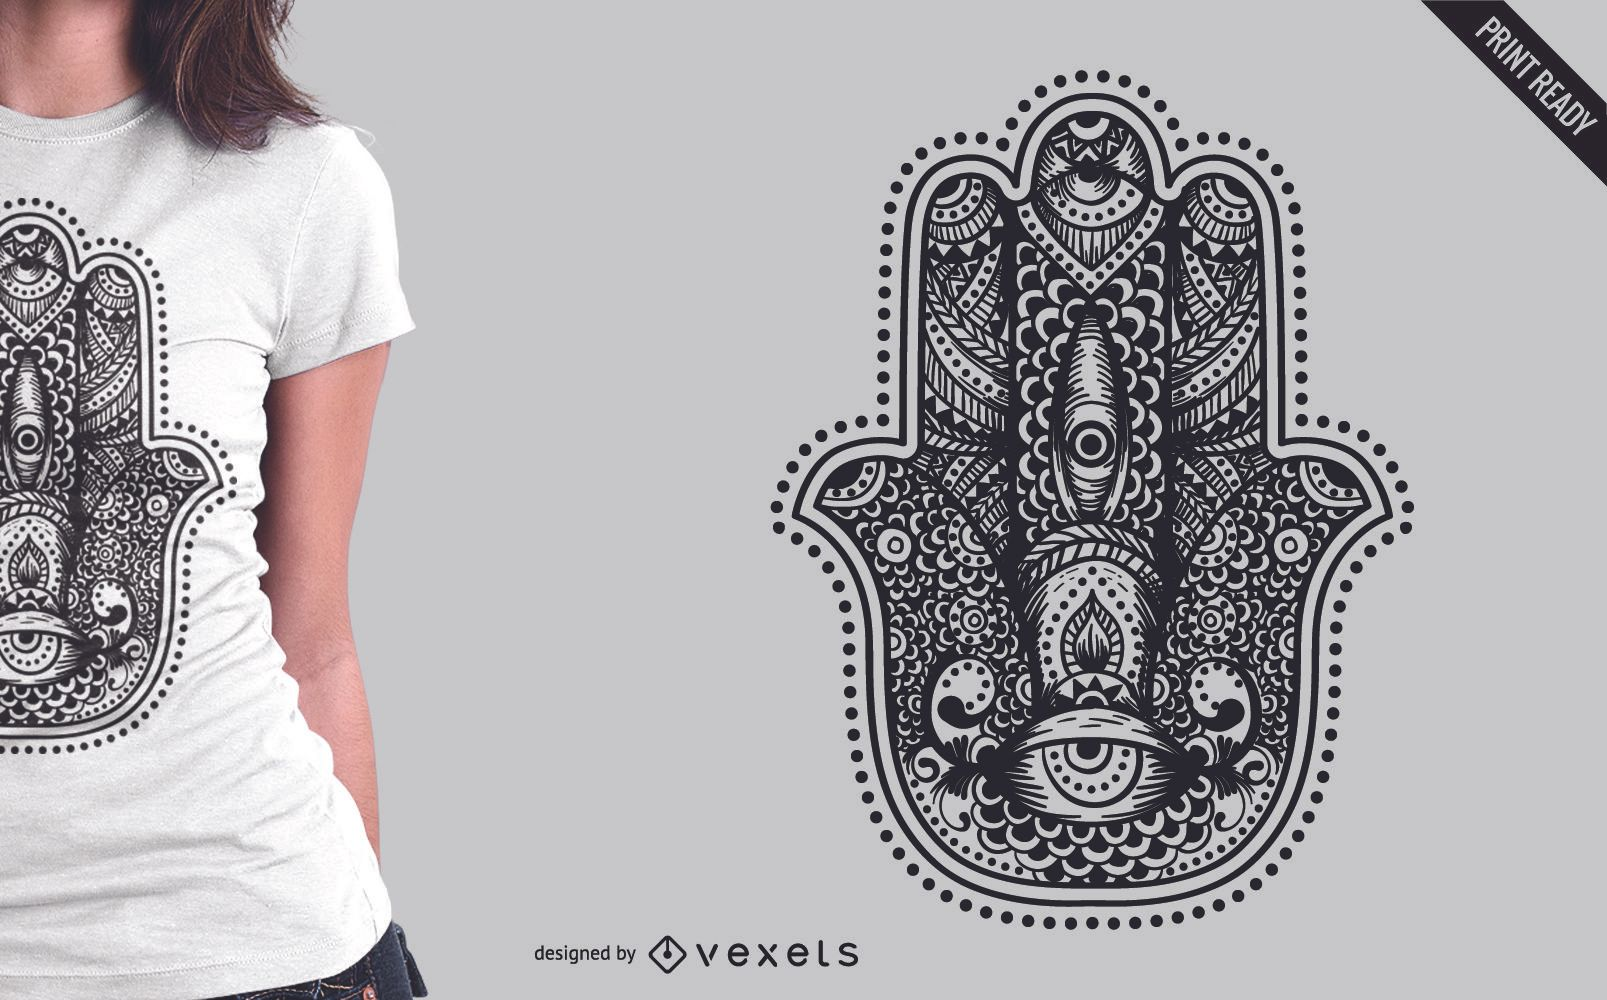 6fbfc8b4 Hamsa illustration t-shit design. Download Large Image 1607x1000px. license  image; user